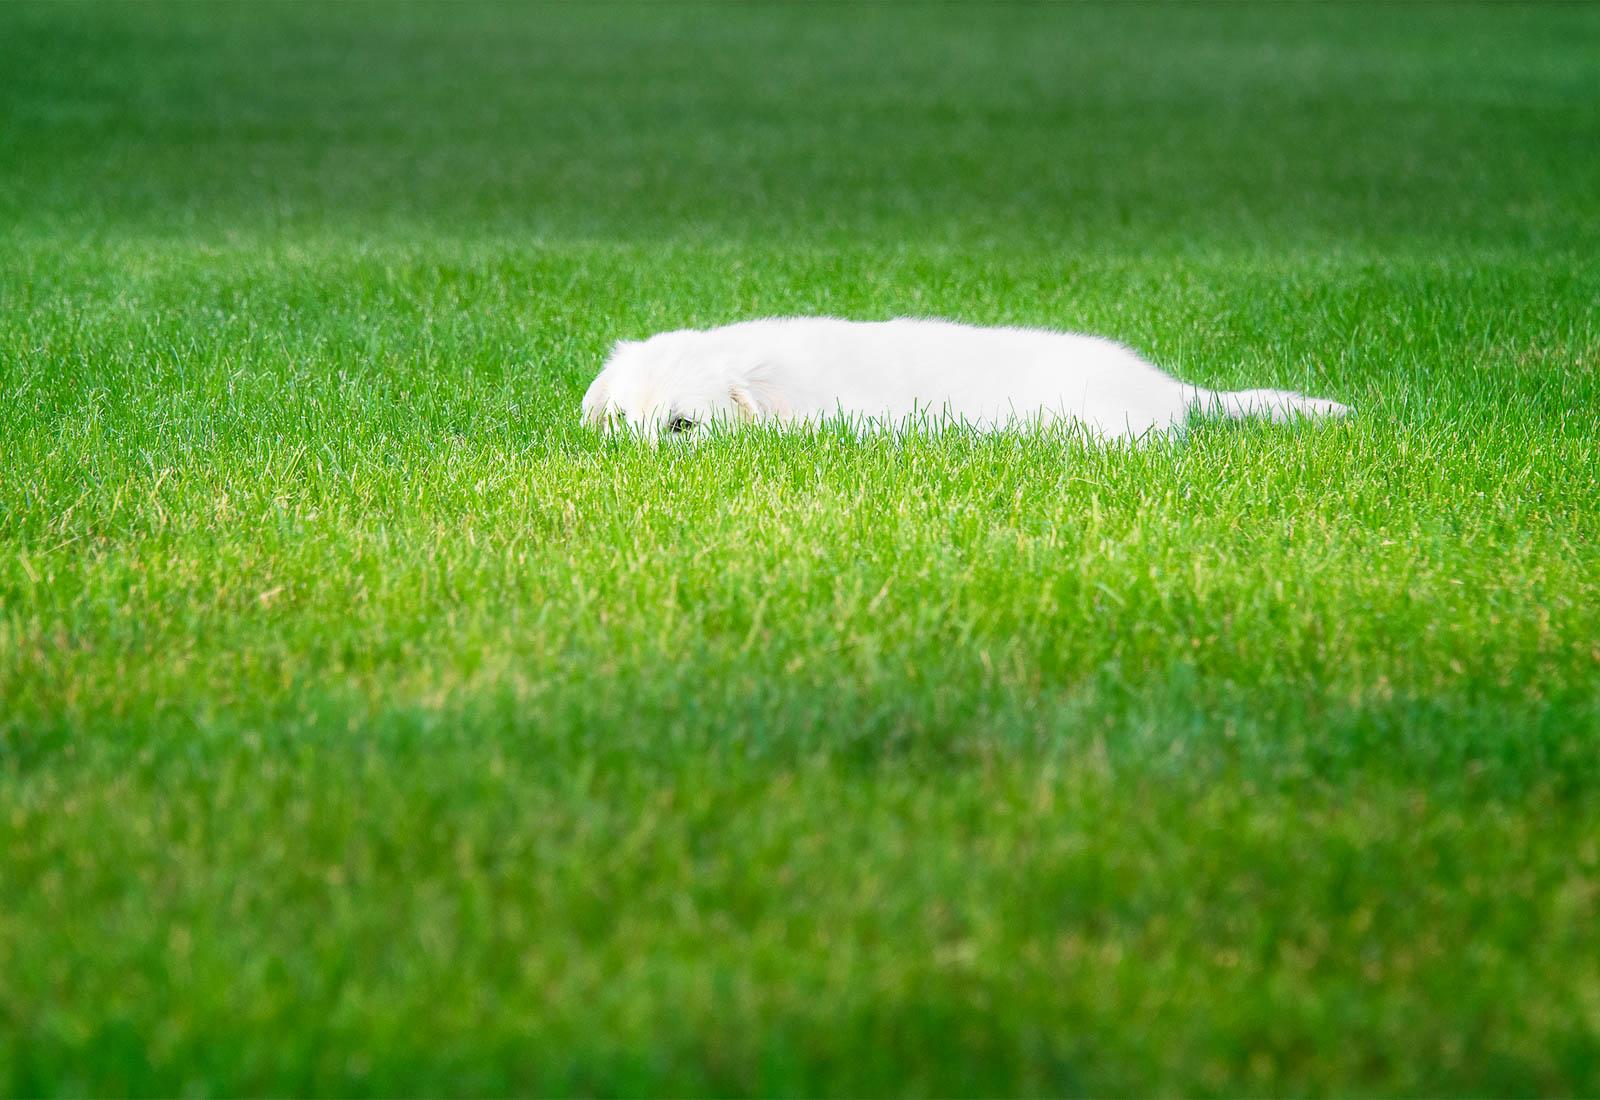 Golden Retriever puppy hiding in the grass